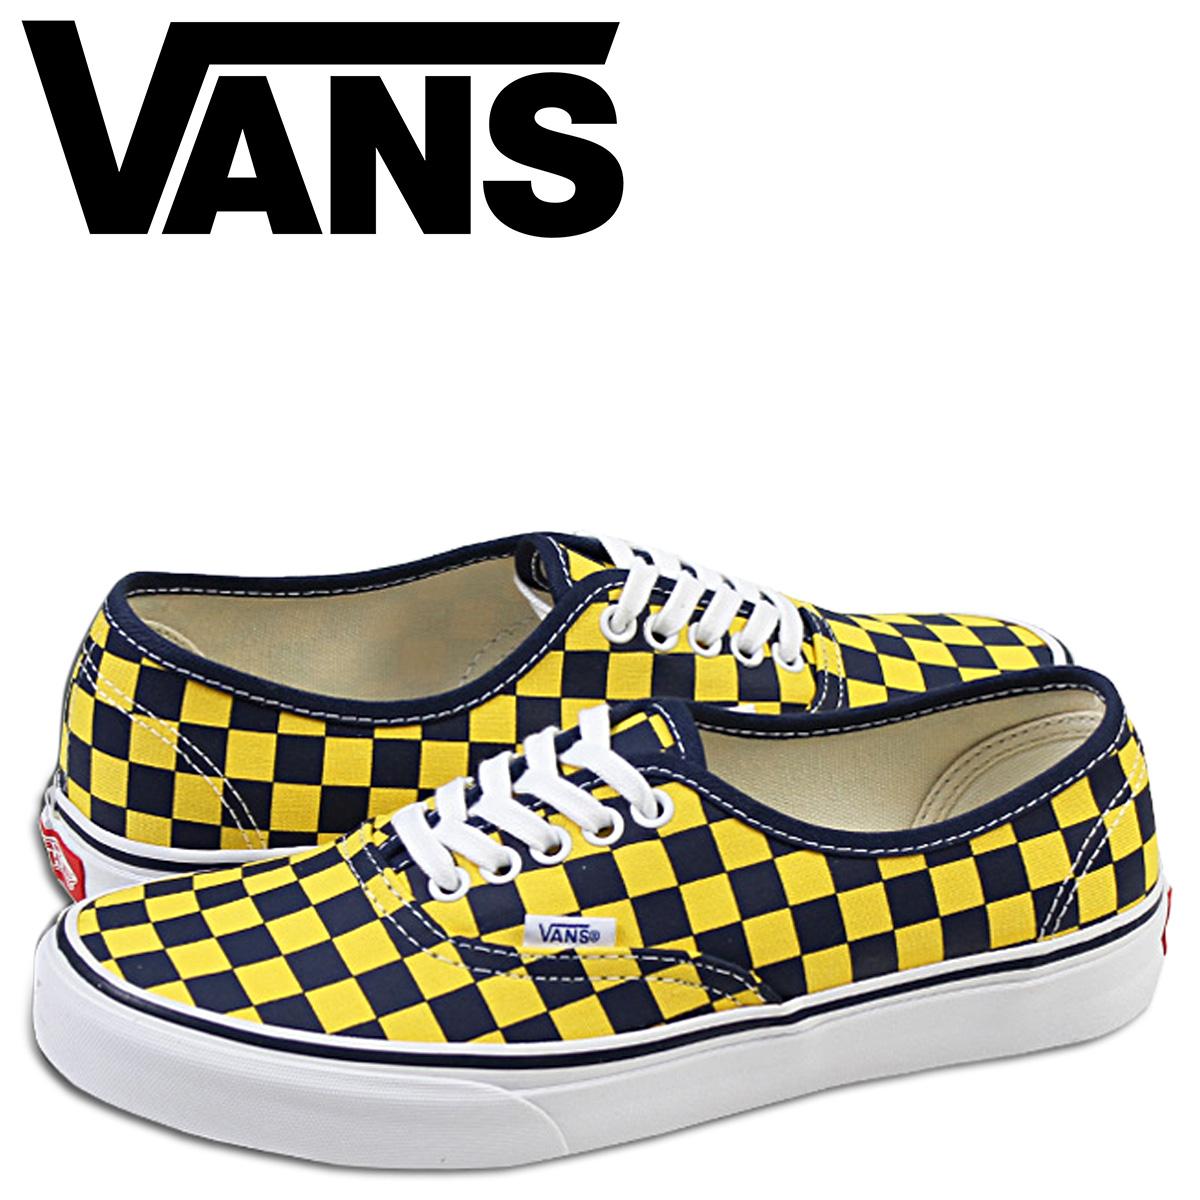 259161c3f3f3 VANS vans authentic sneakers AUTHENTIC GOLDEN COAST VN-0W4NDI2 men shoes  yellow